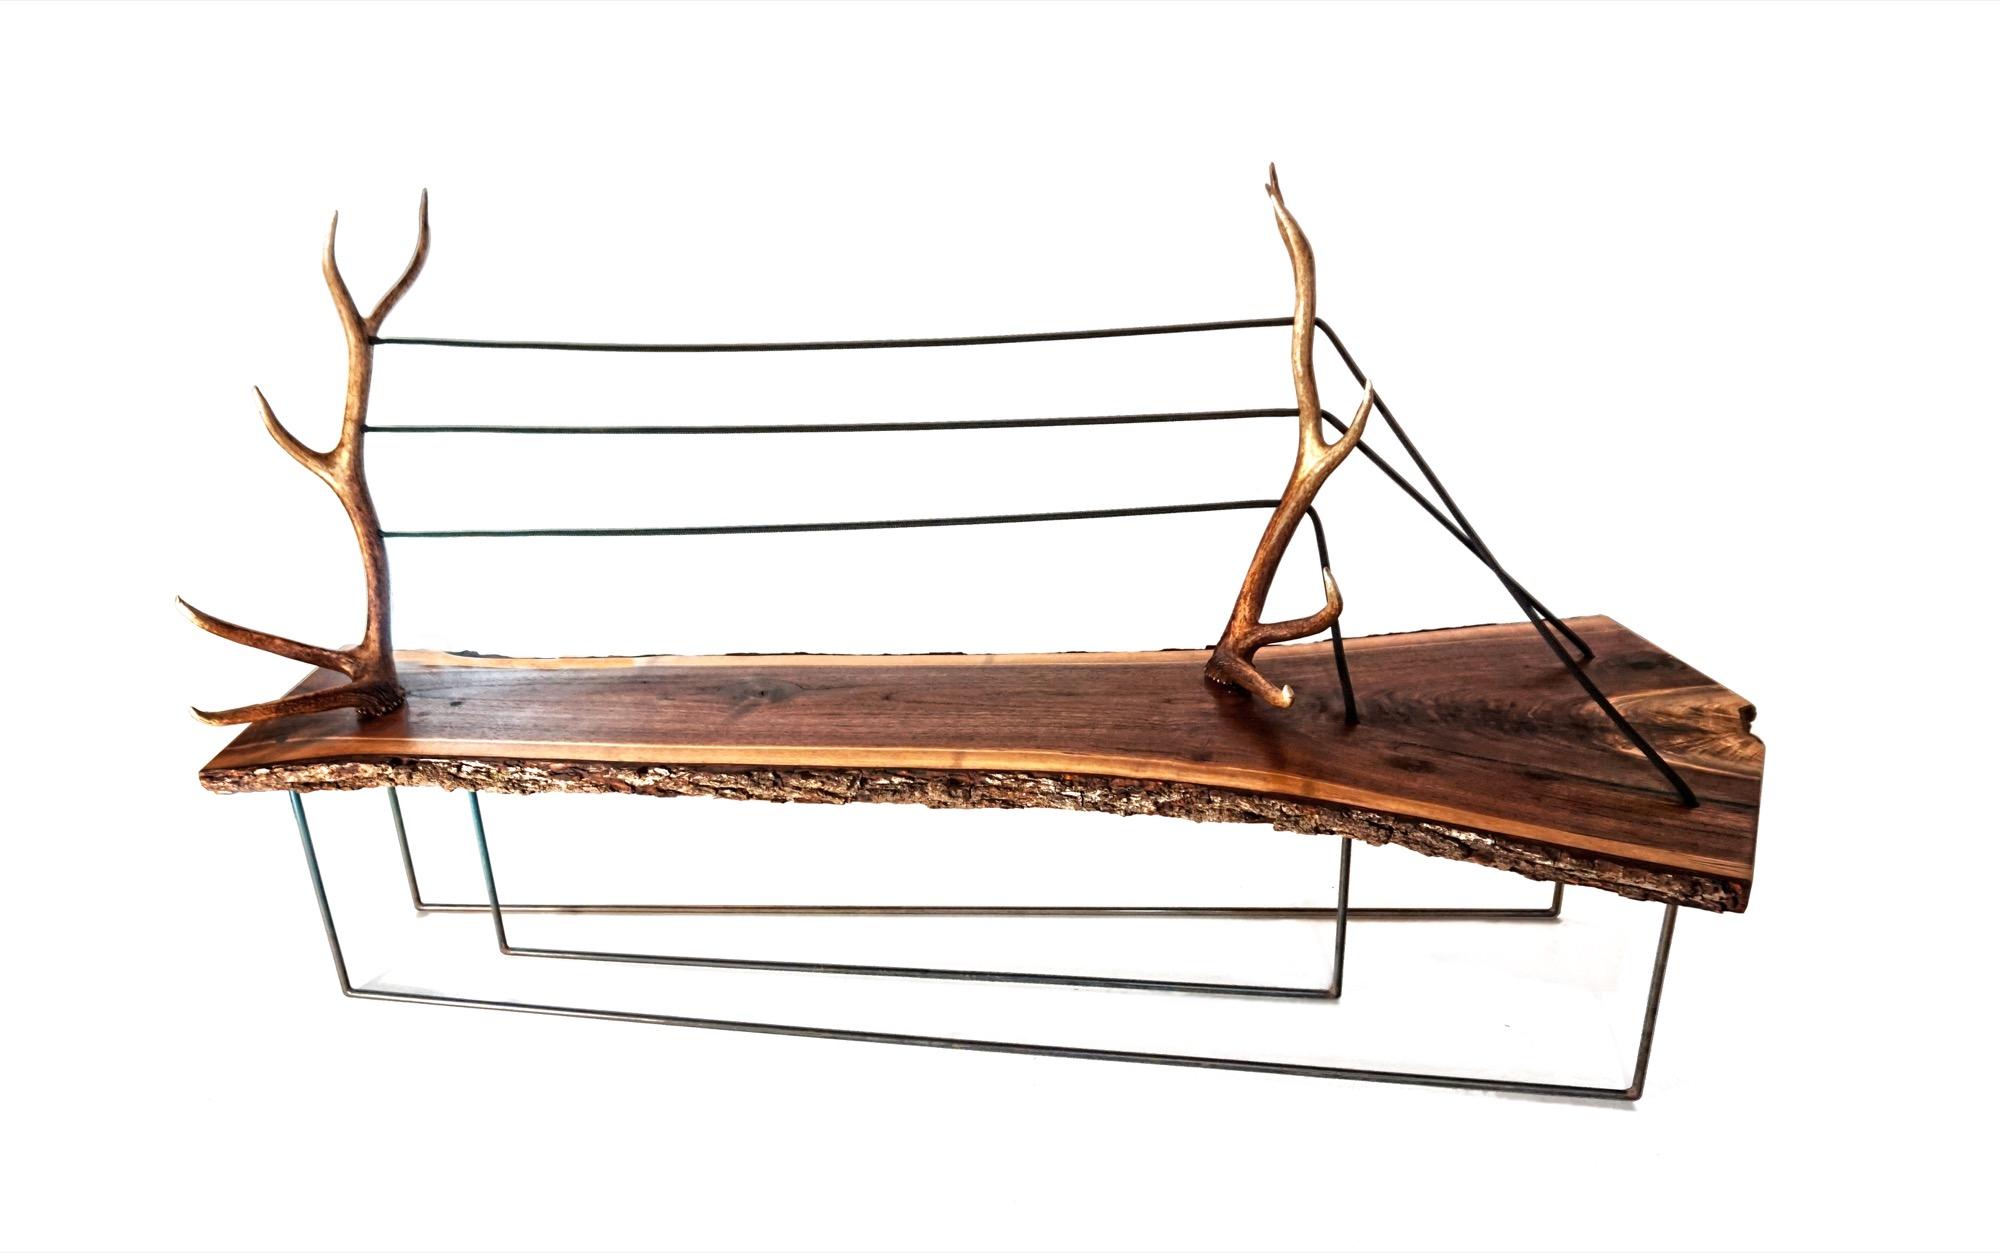 Antler-walnut bench by MTN Lab